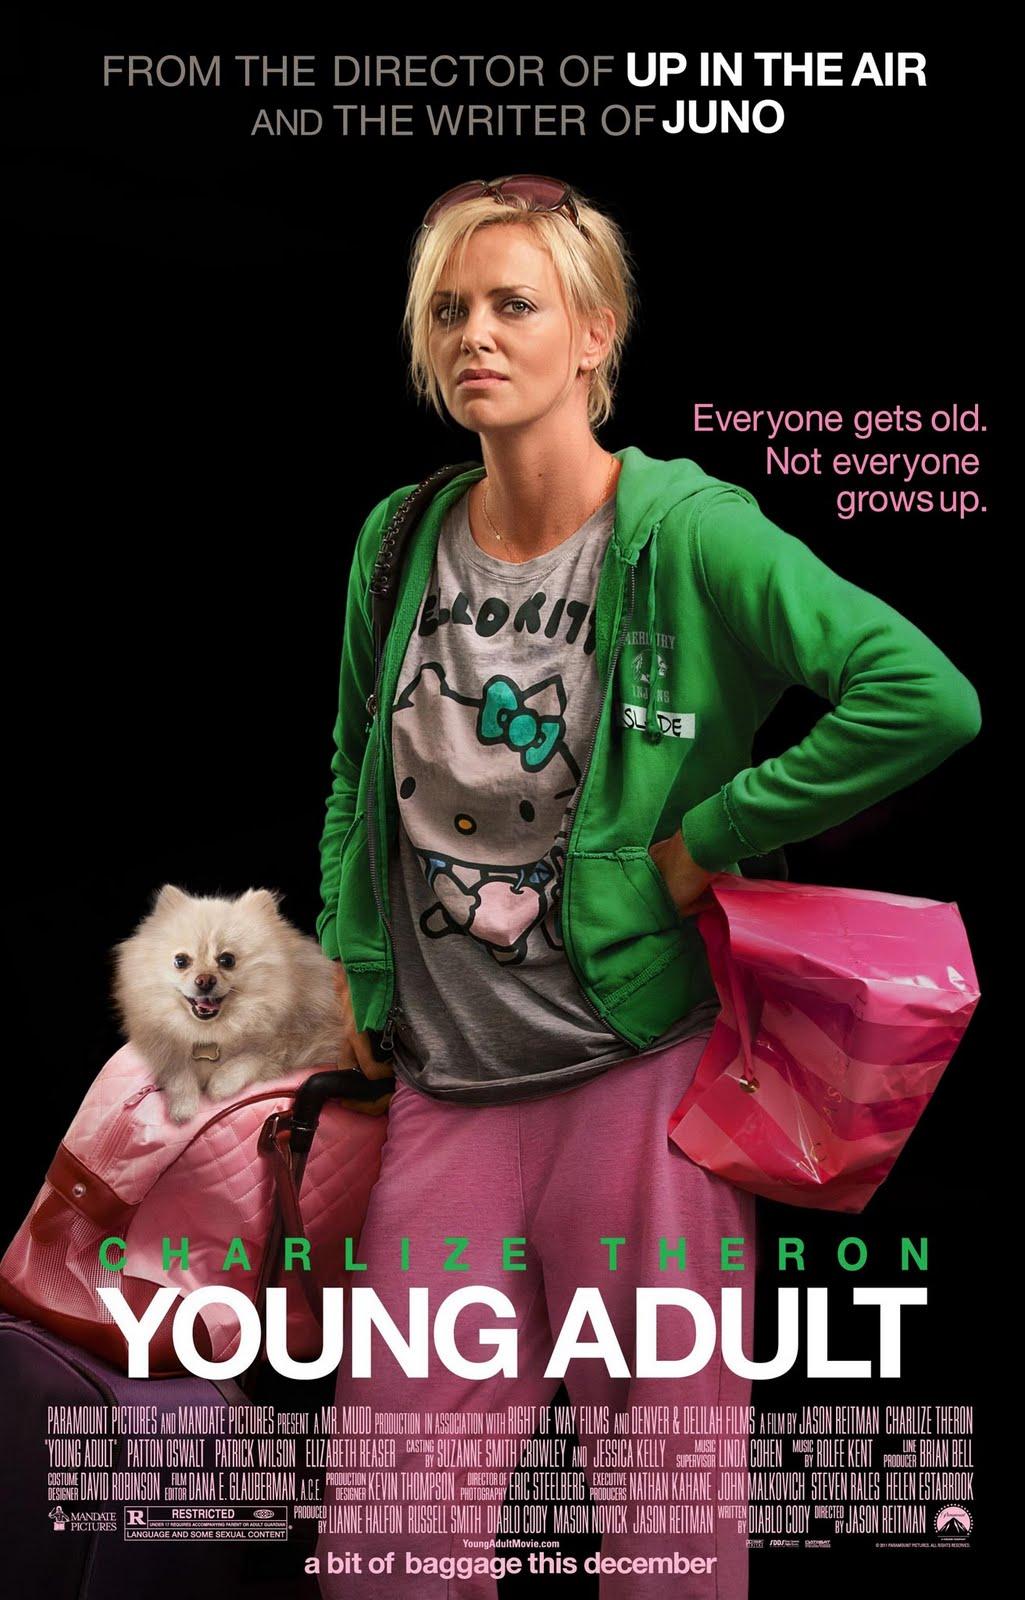 [MEDIAFIRE/JUMBOFILES!!!] Young Adult (2011) - นางสาวตัวแสบแอบตีท้ายครัว [Mini-HD][Audio:Thai/Eng]  Young-adult-poster-2-xl